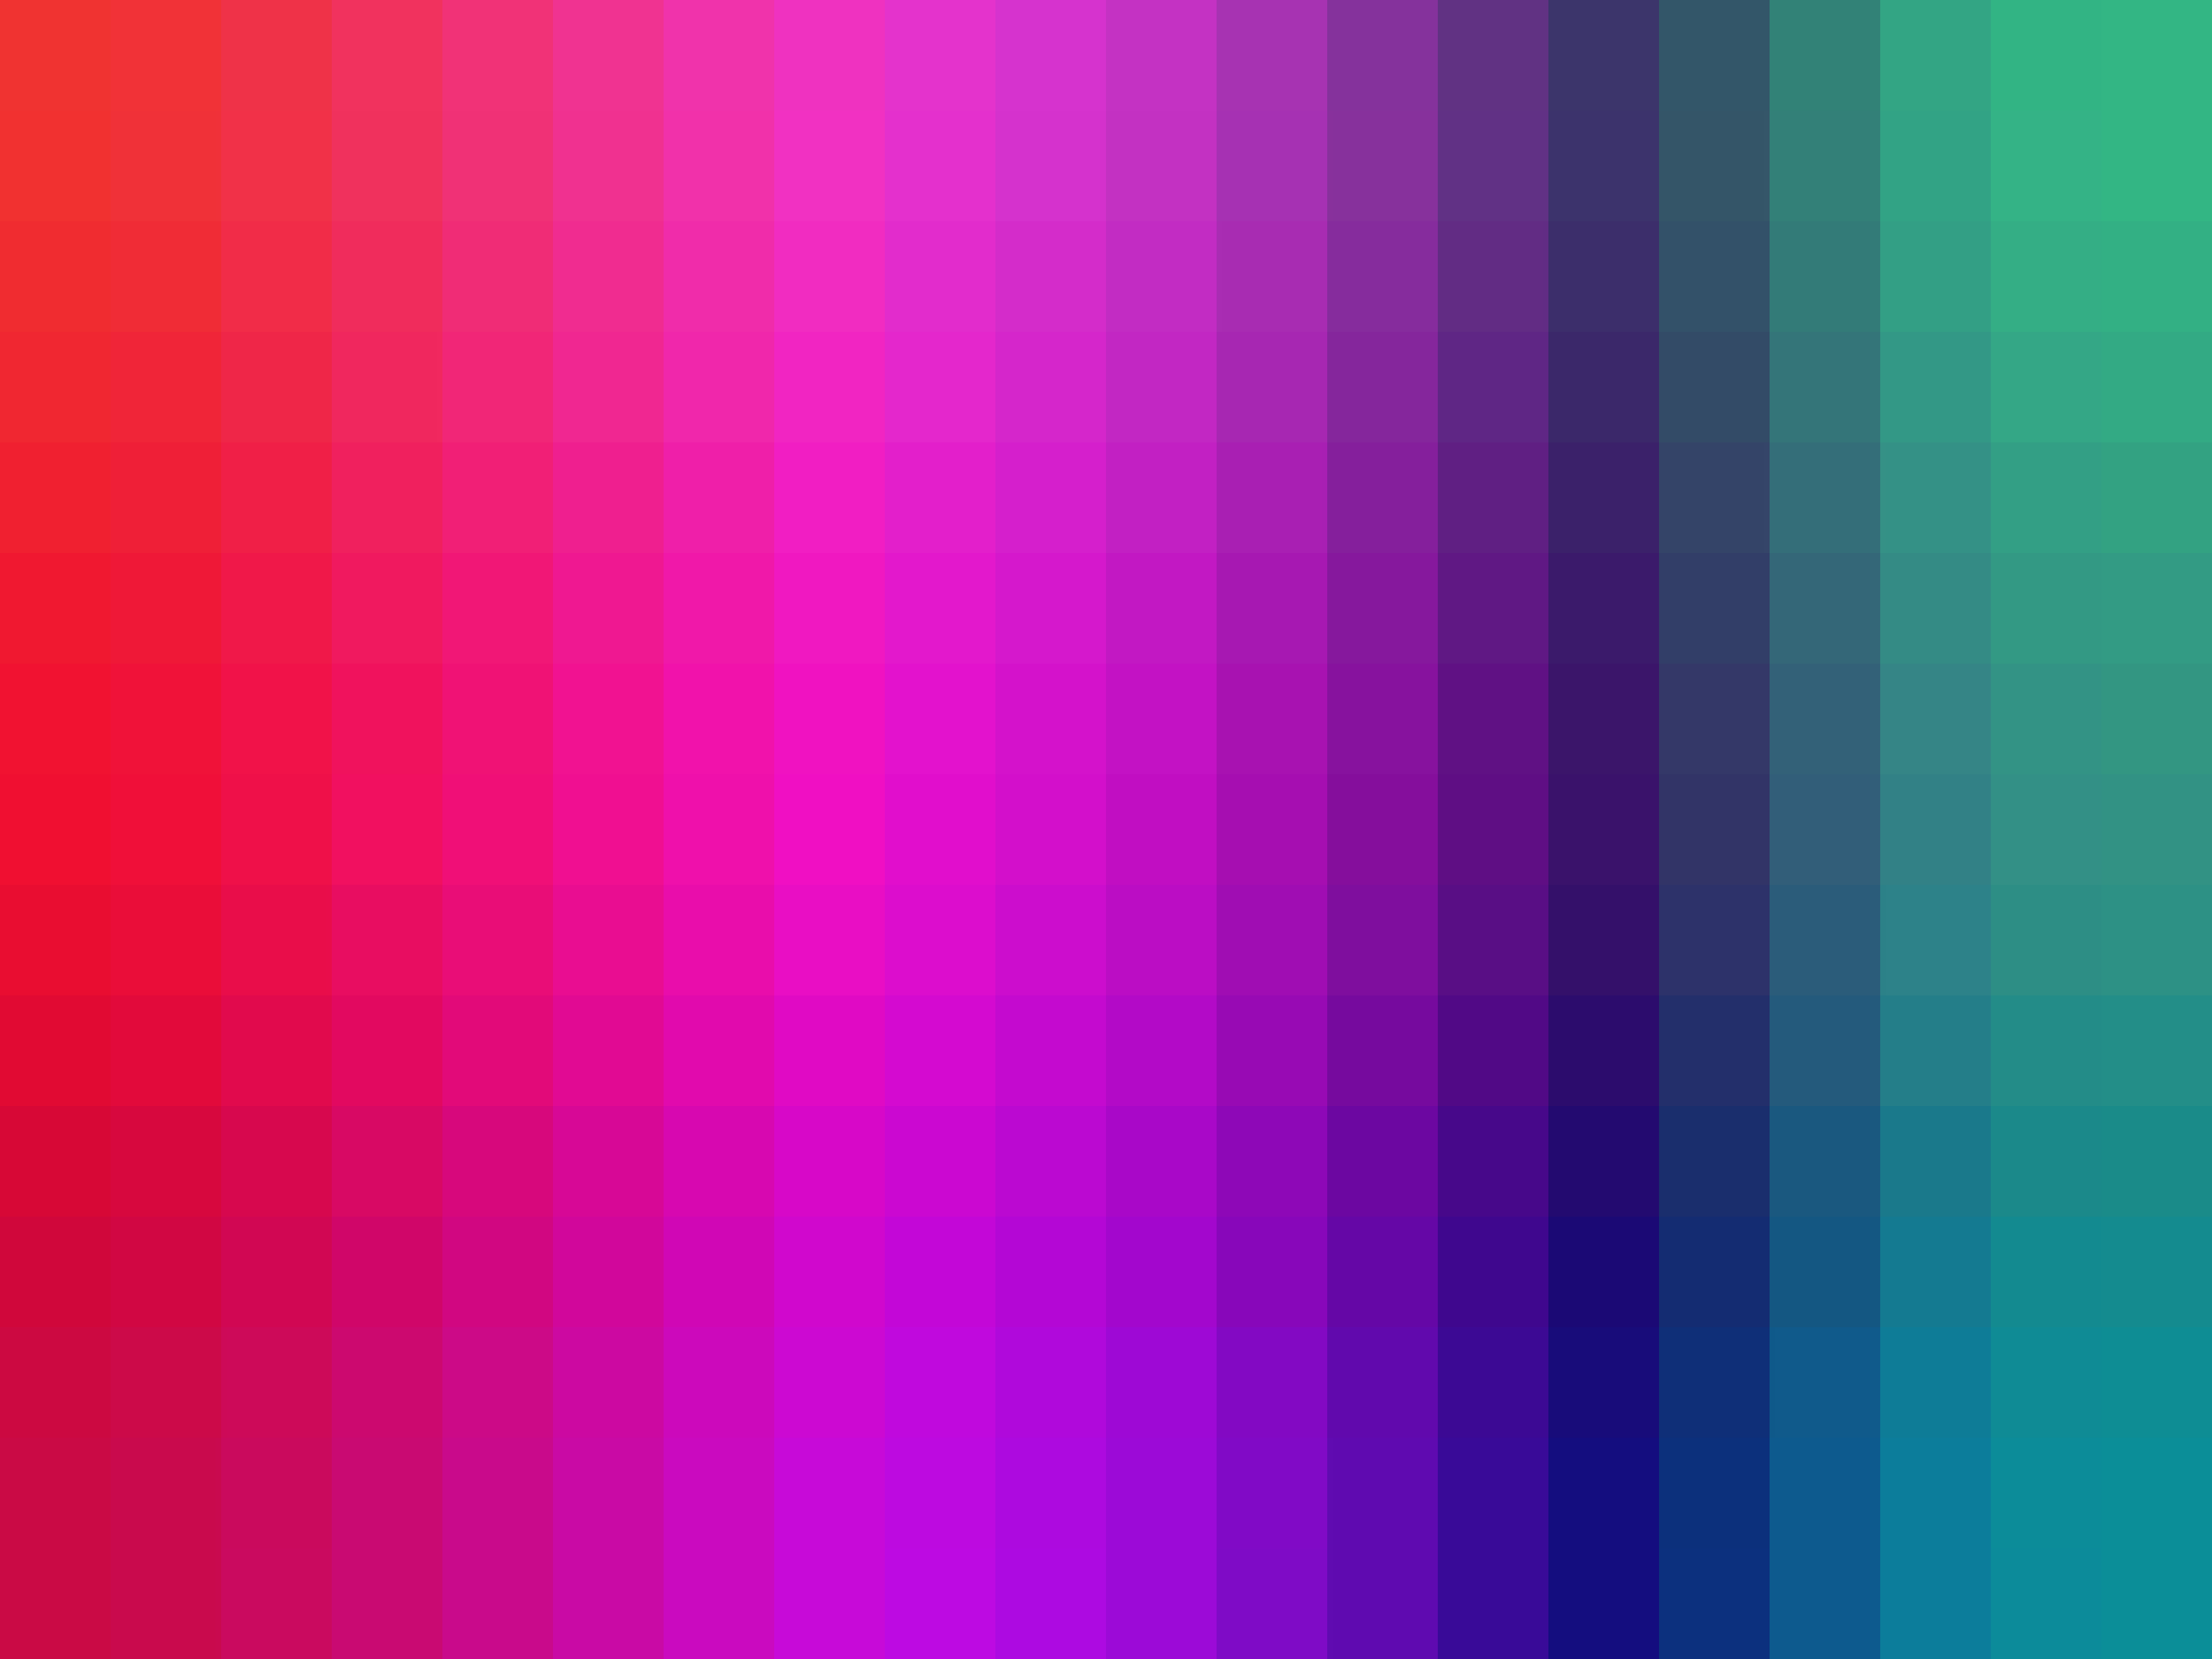 free stock photo 12651 background of vibrant pixels